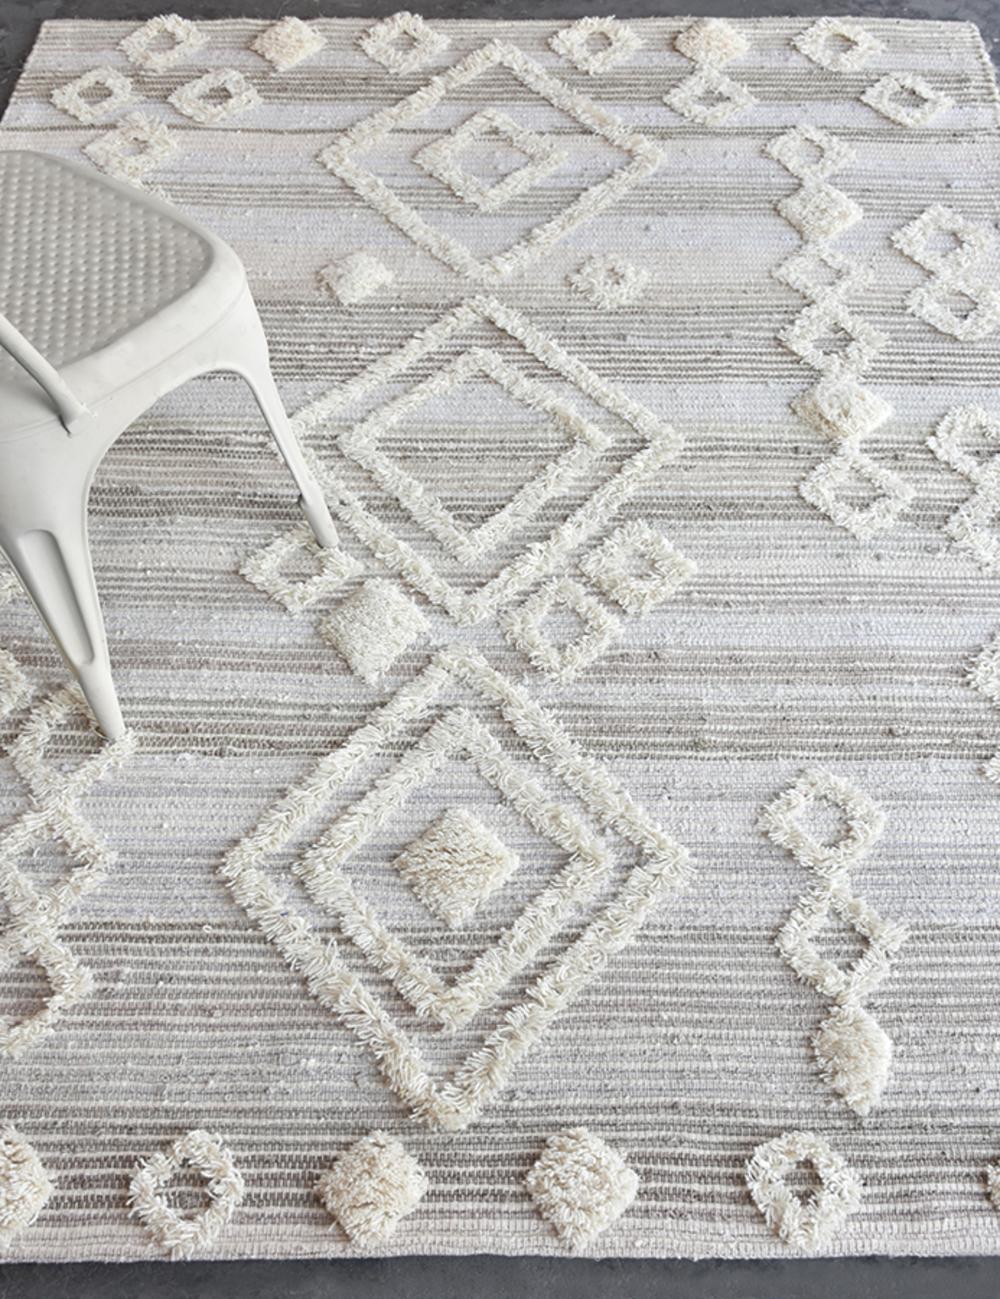 Dovetail Furniture - Fraser Rug, 5x8